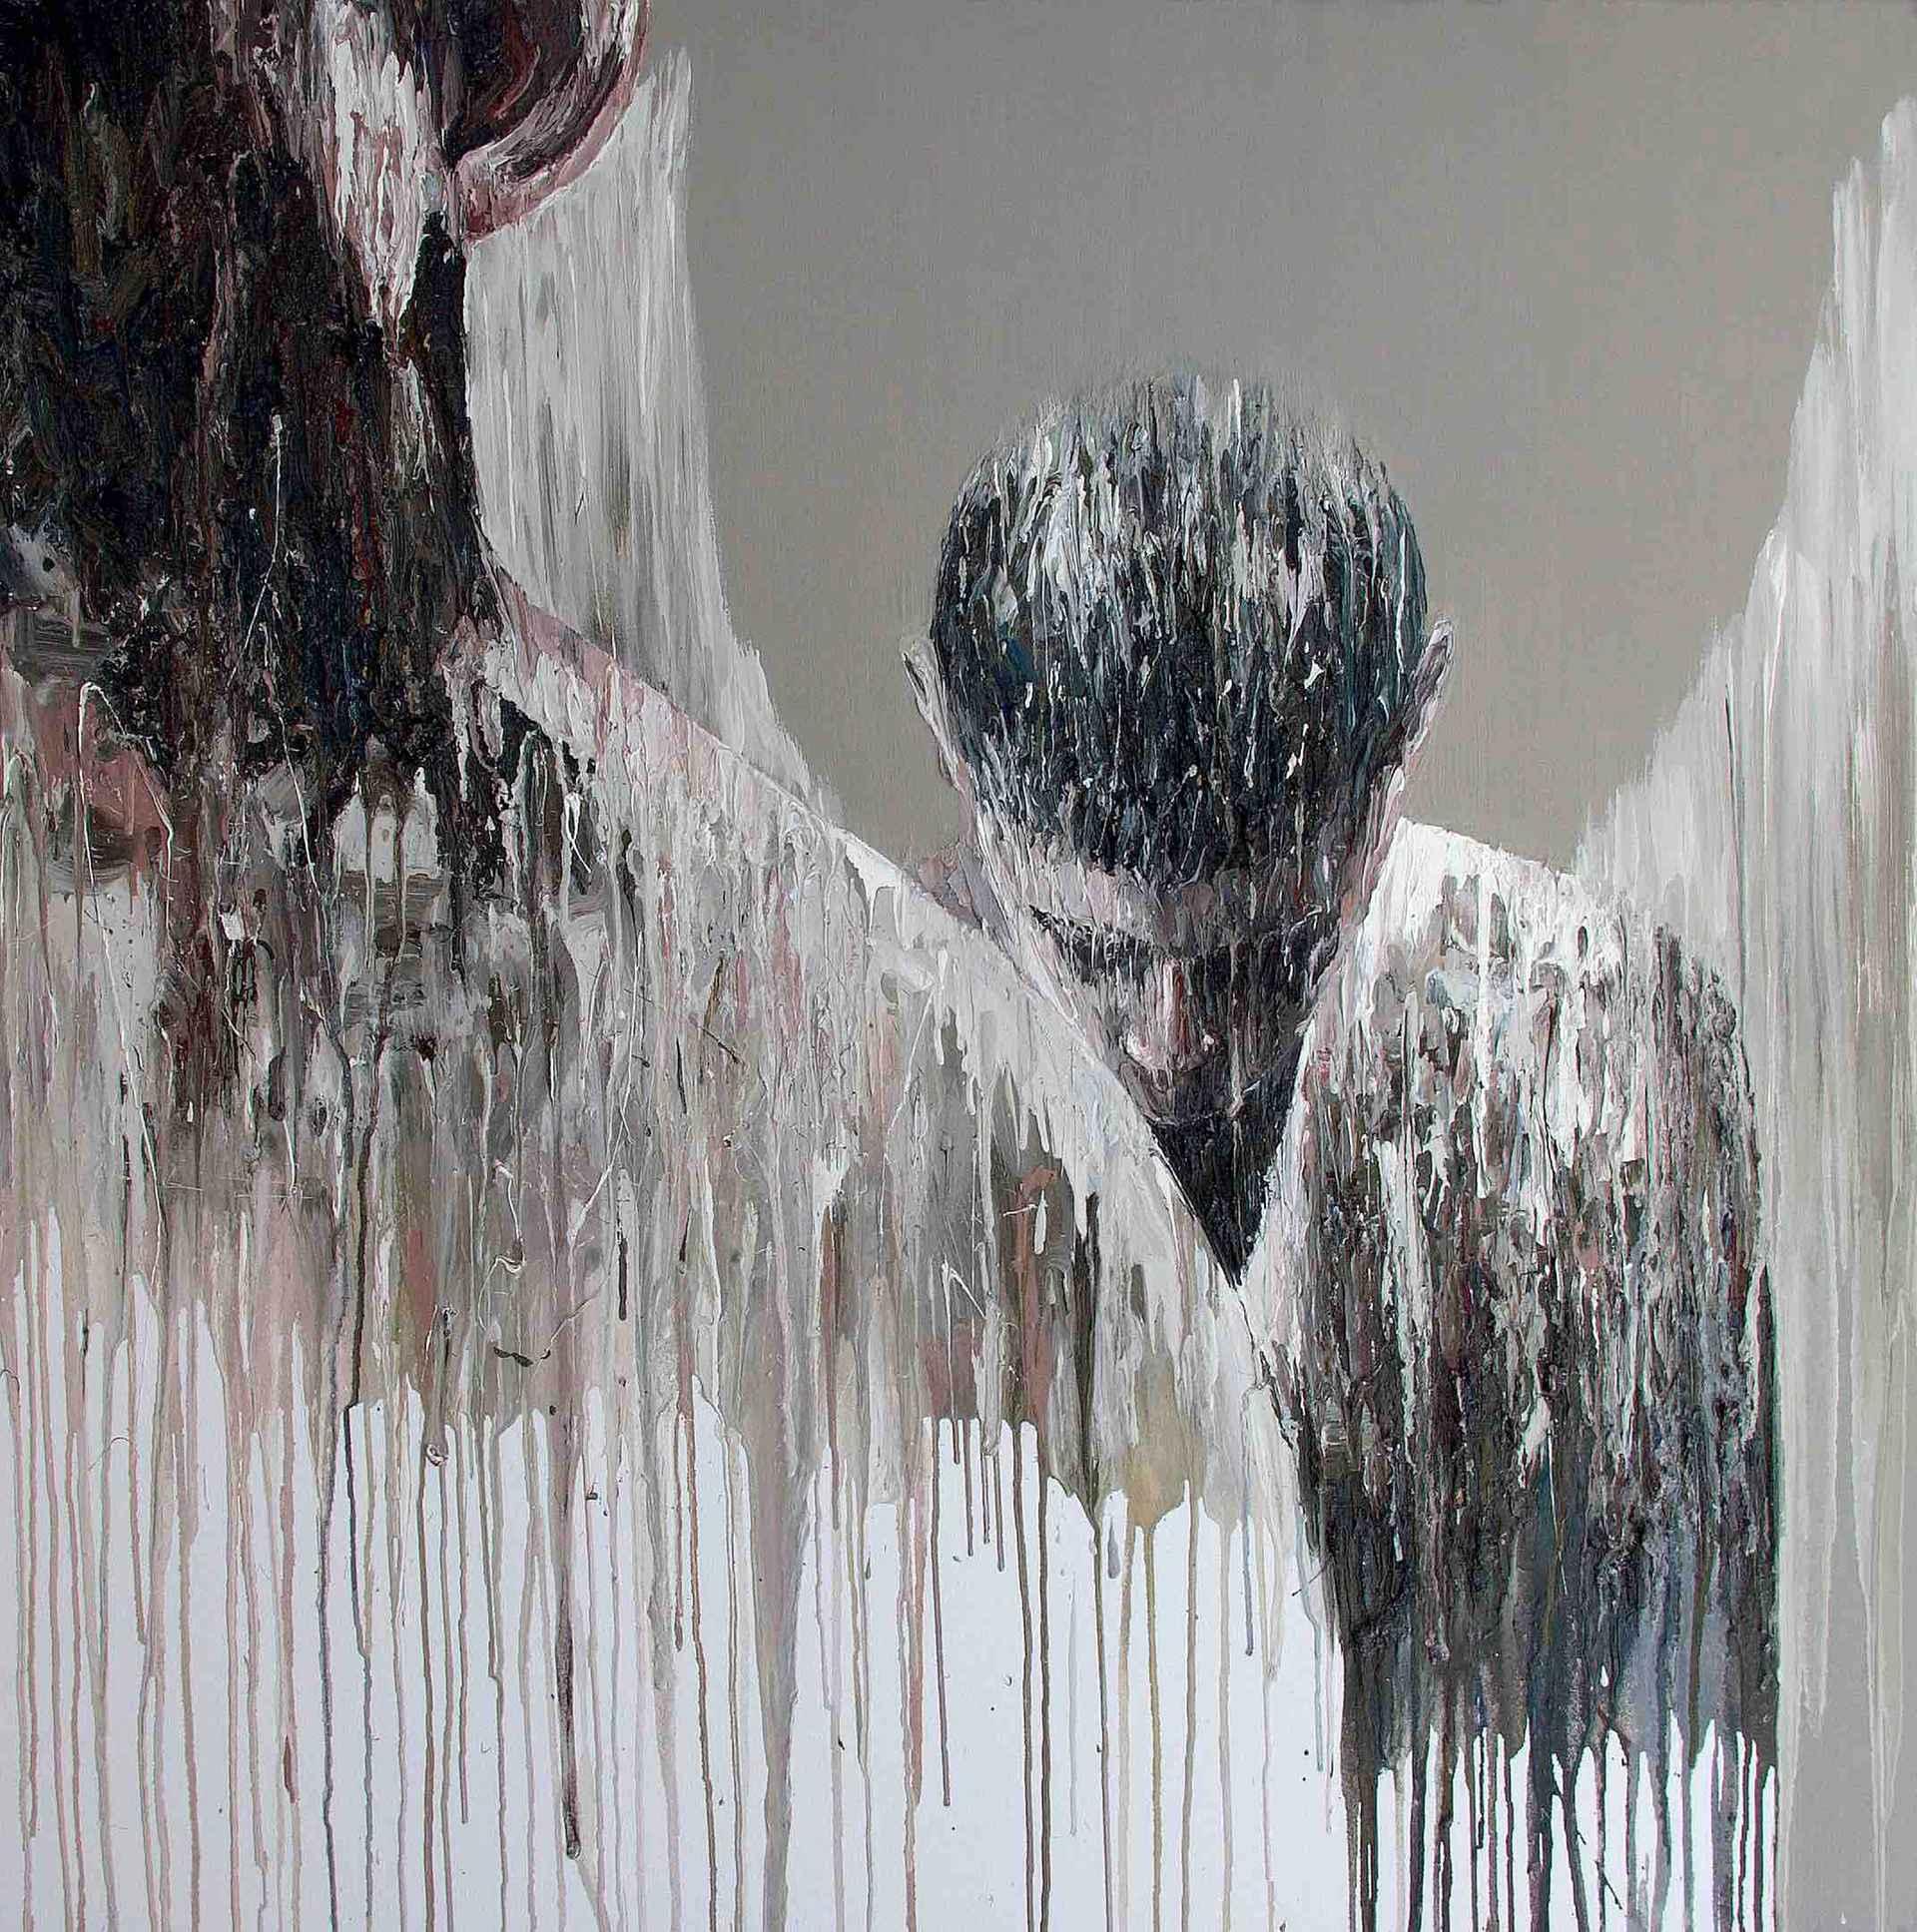 Xanthe & Aesop by Carl Melegari